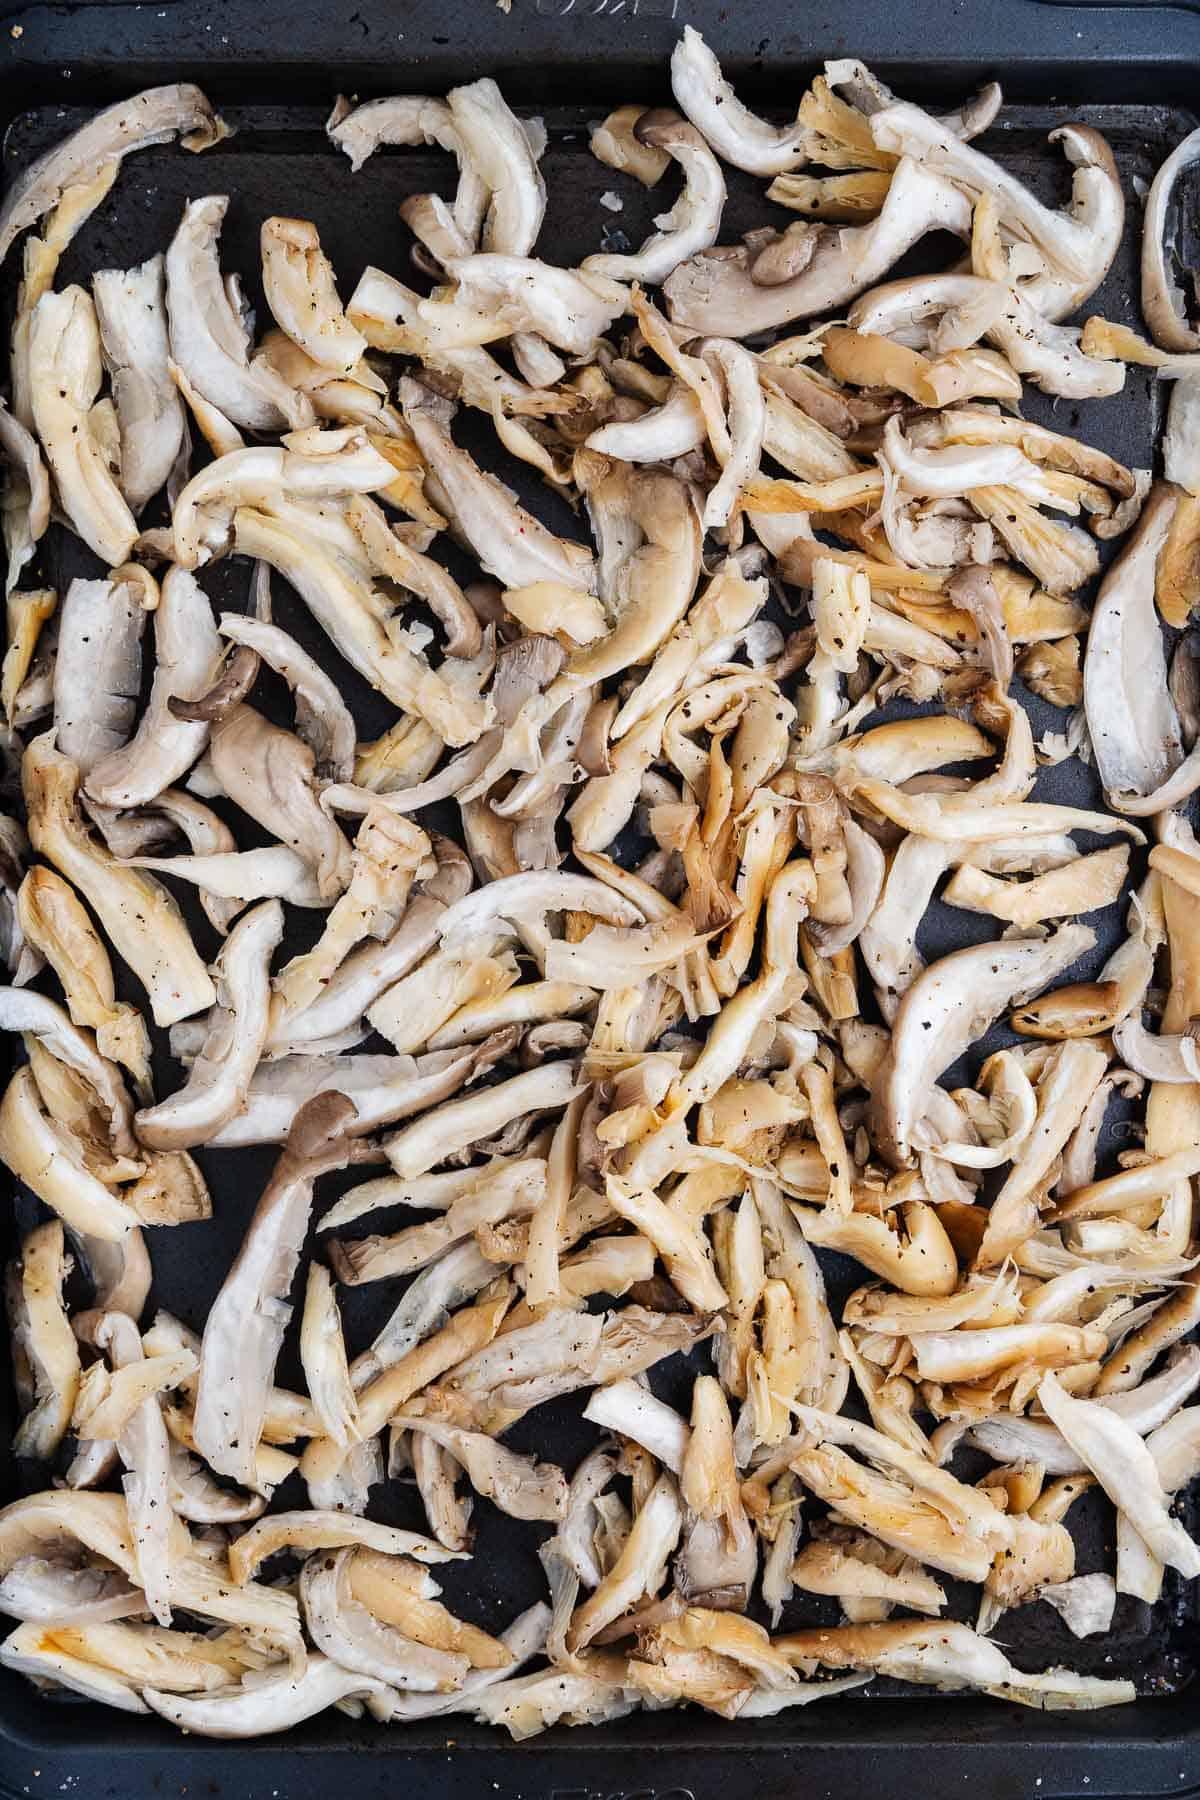 Shredded Oyster Mushrooms on a Pan